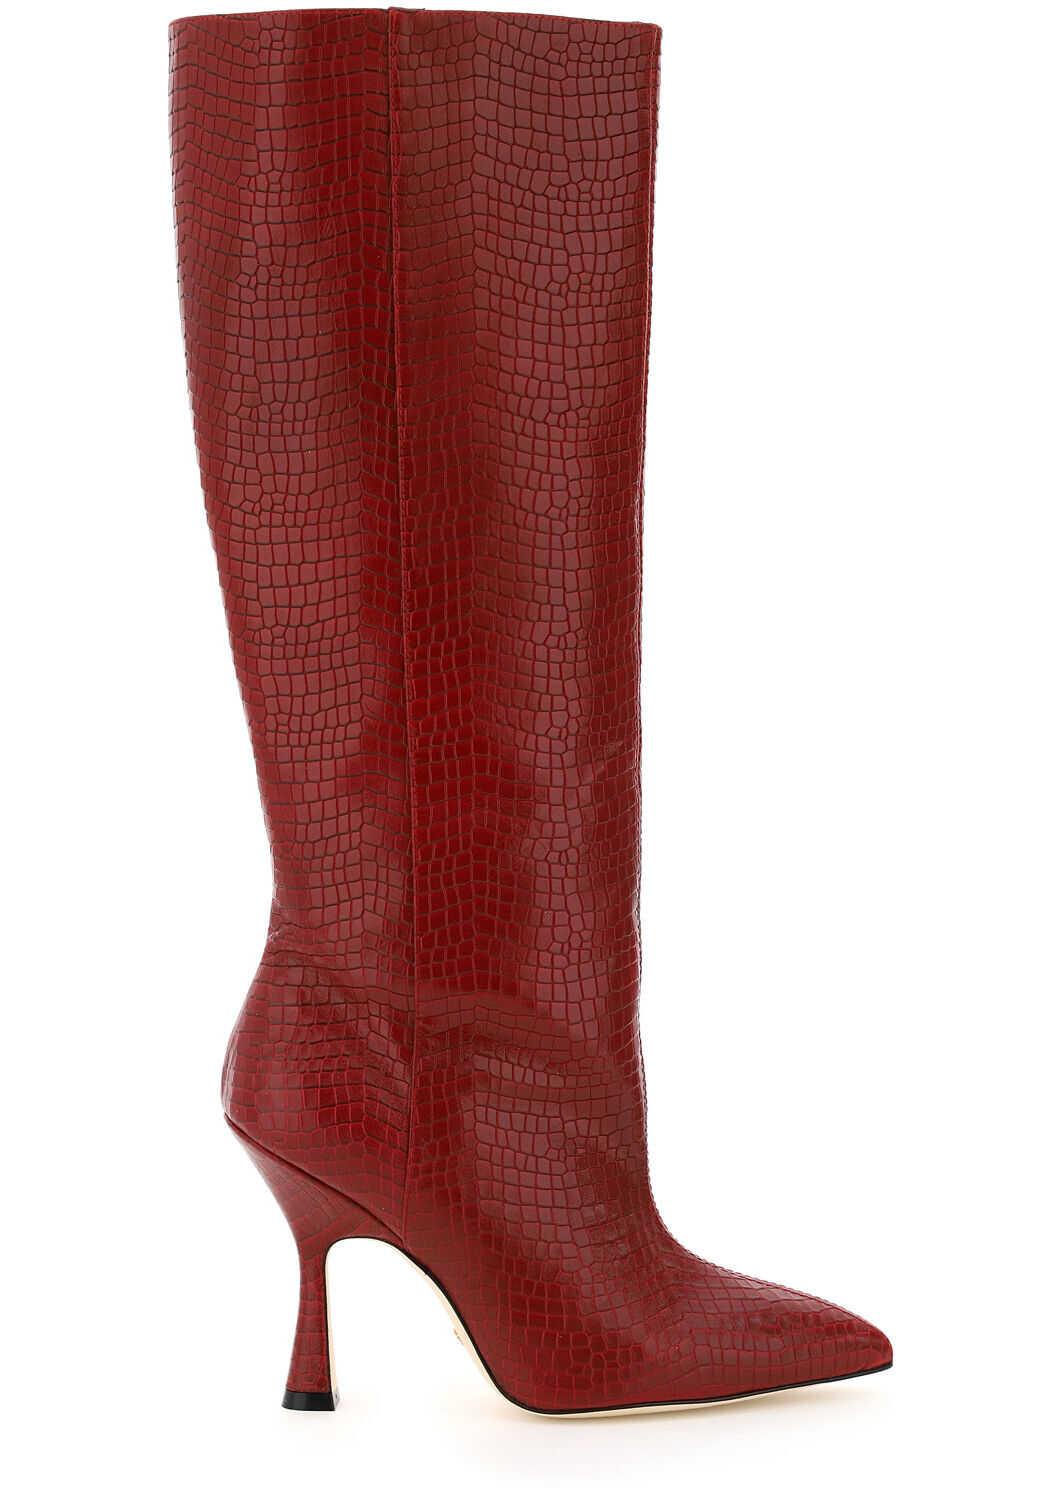 Stuart Weitzman Parton Crocodile Embossed Leather Boots PARTON CHILI imagine b-mall.ro